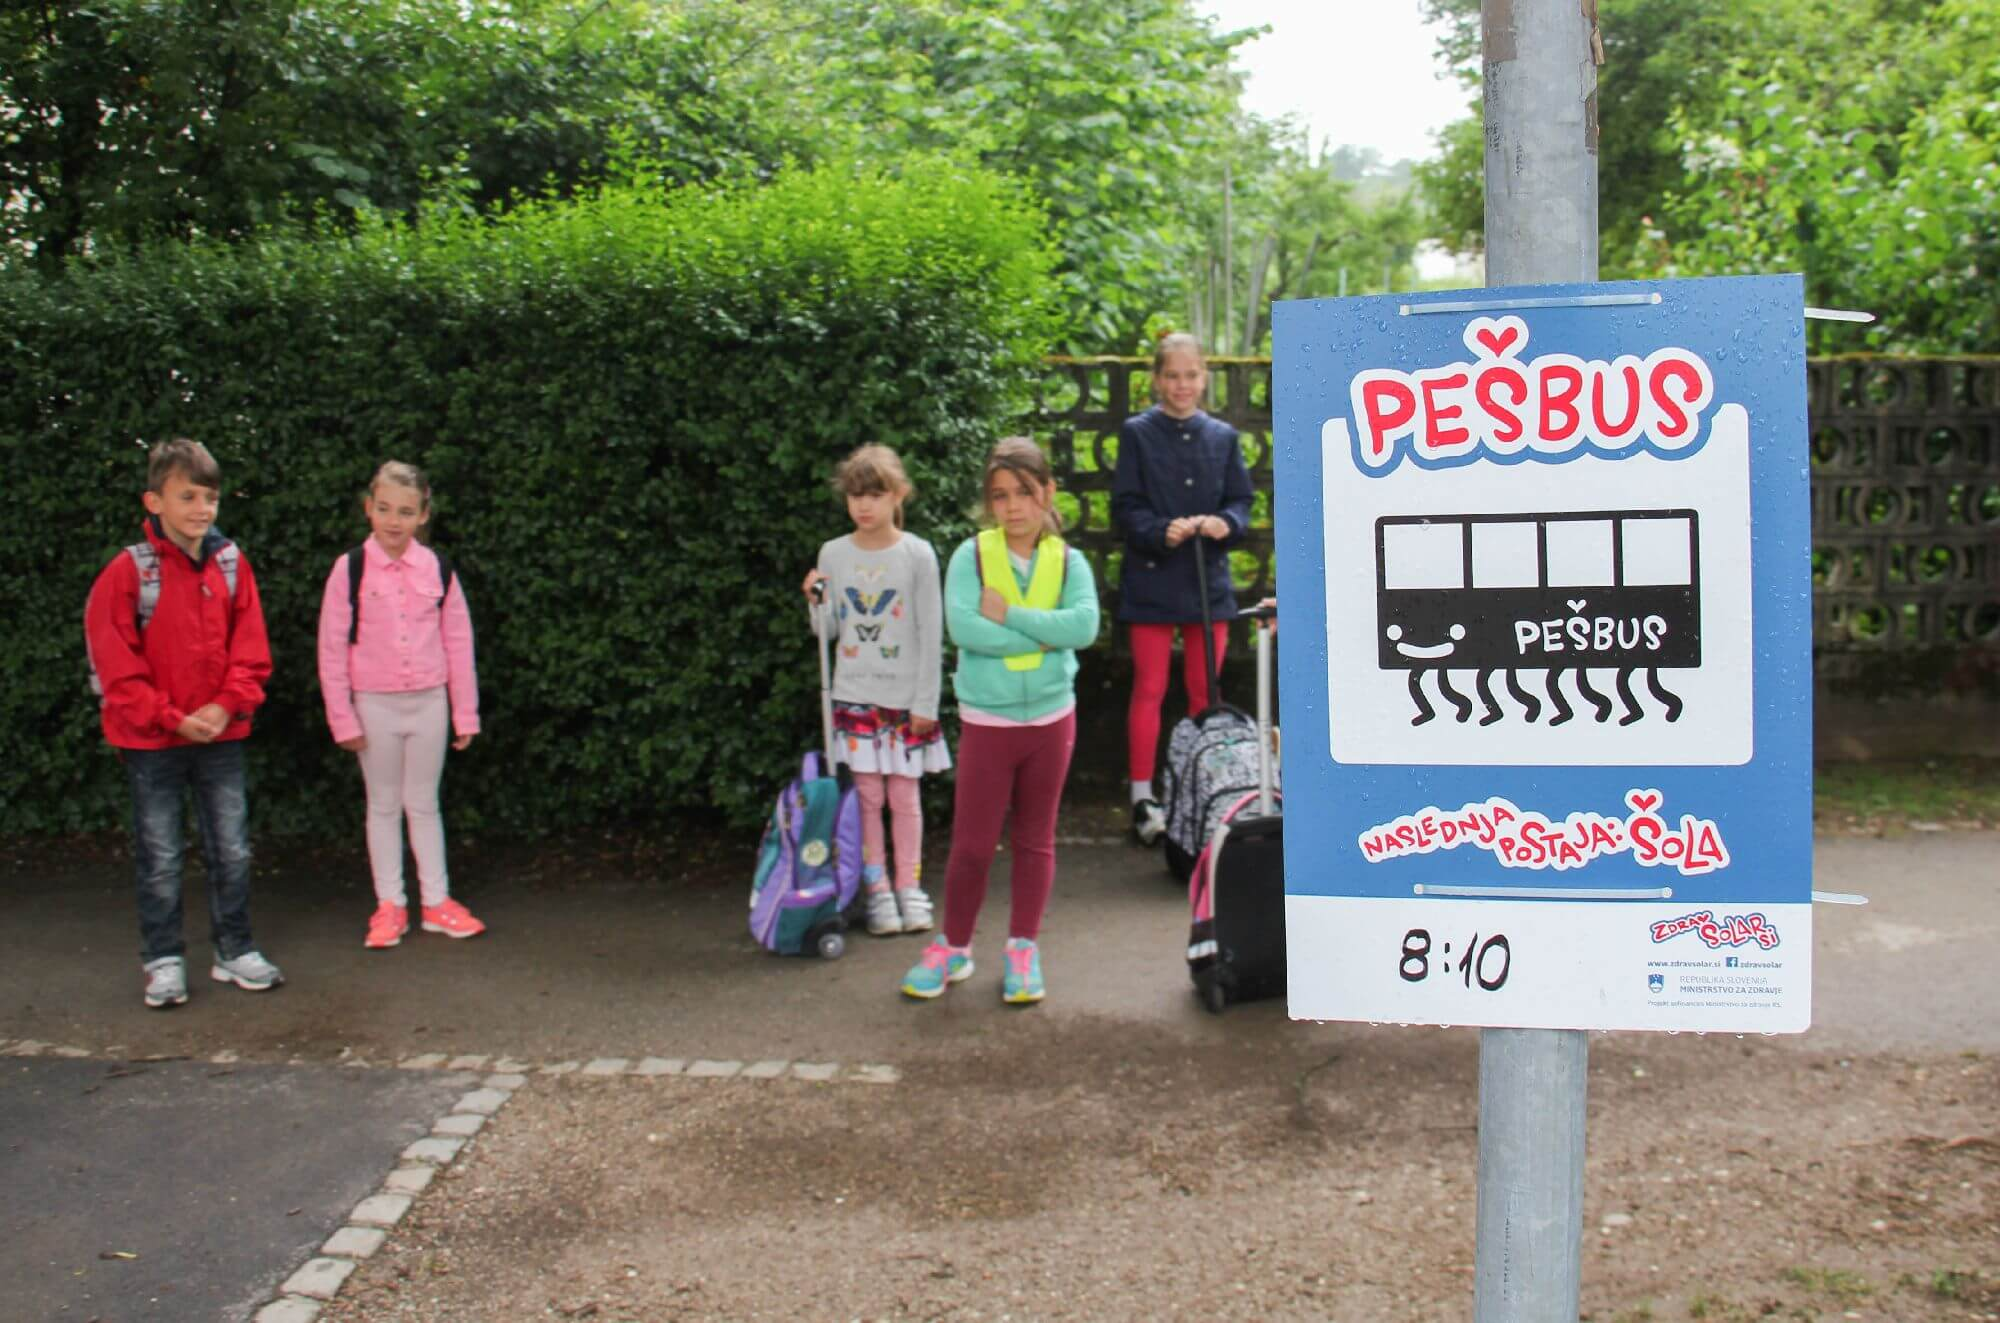 Aktivno v šolo s Pešbusom in Bicivlakom